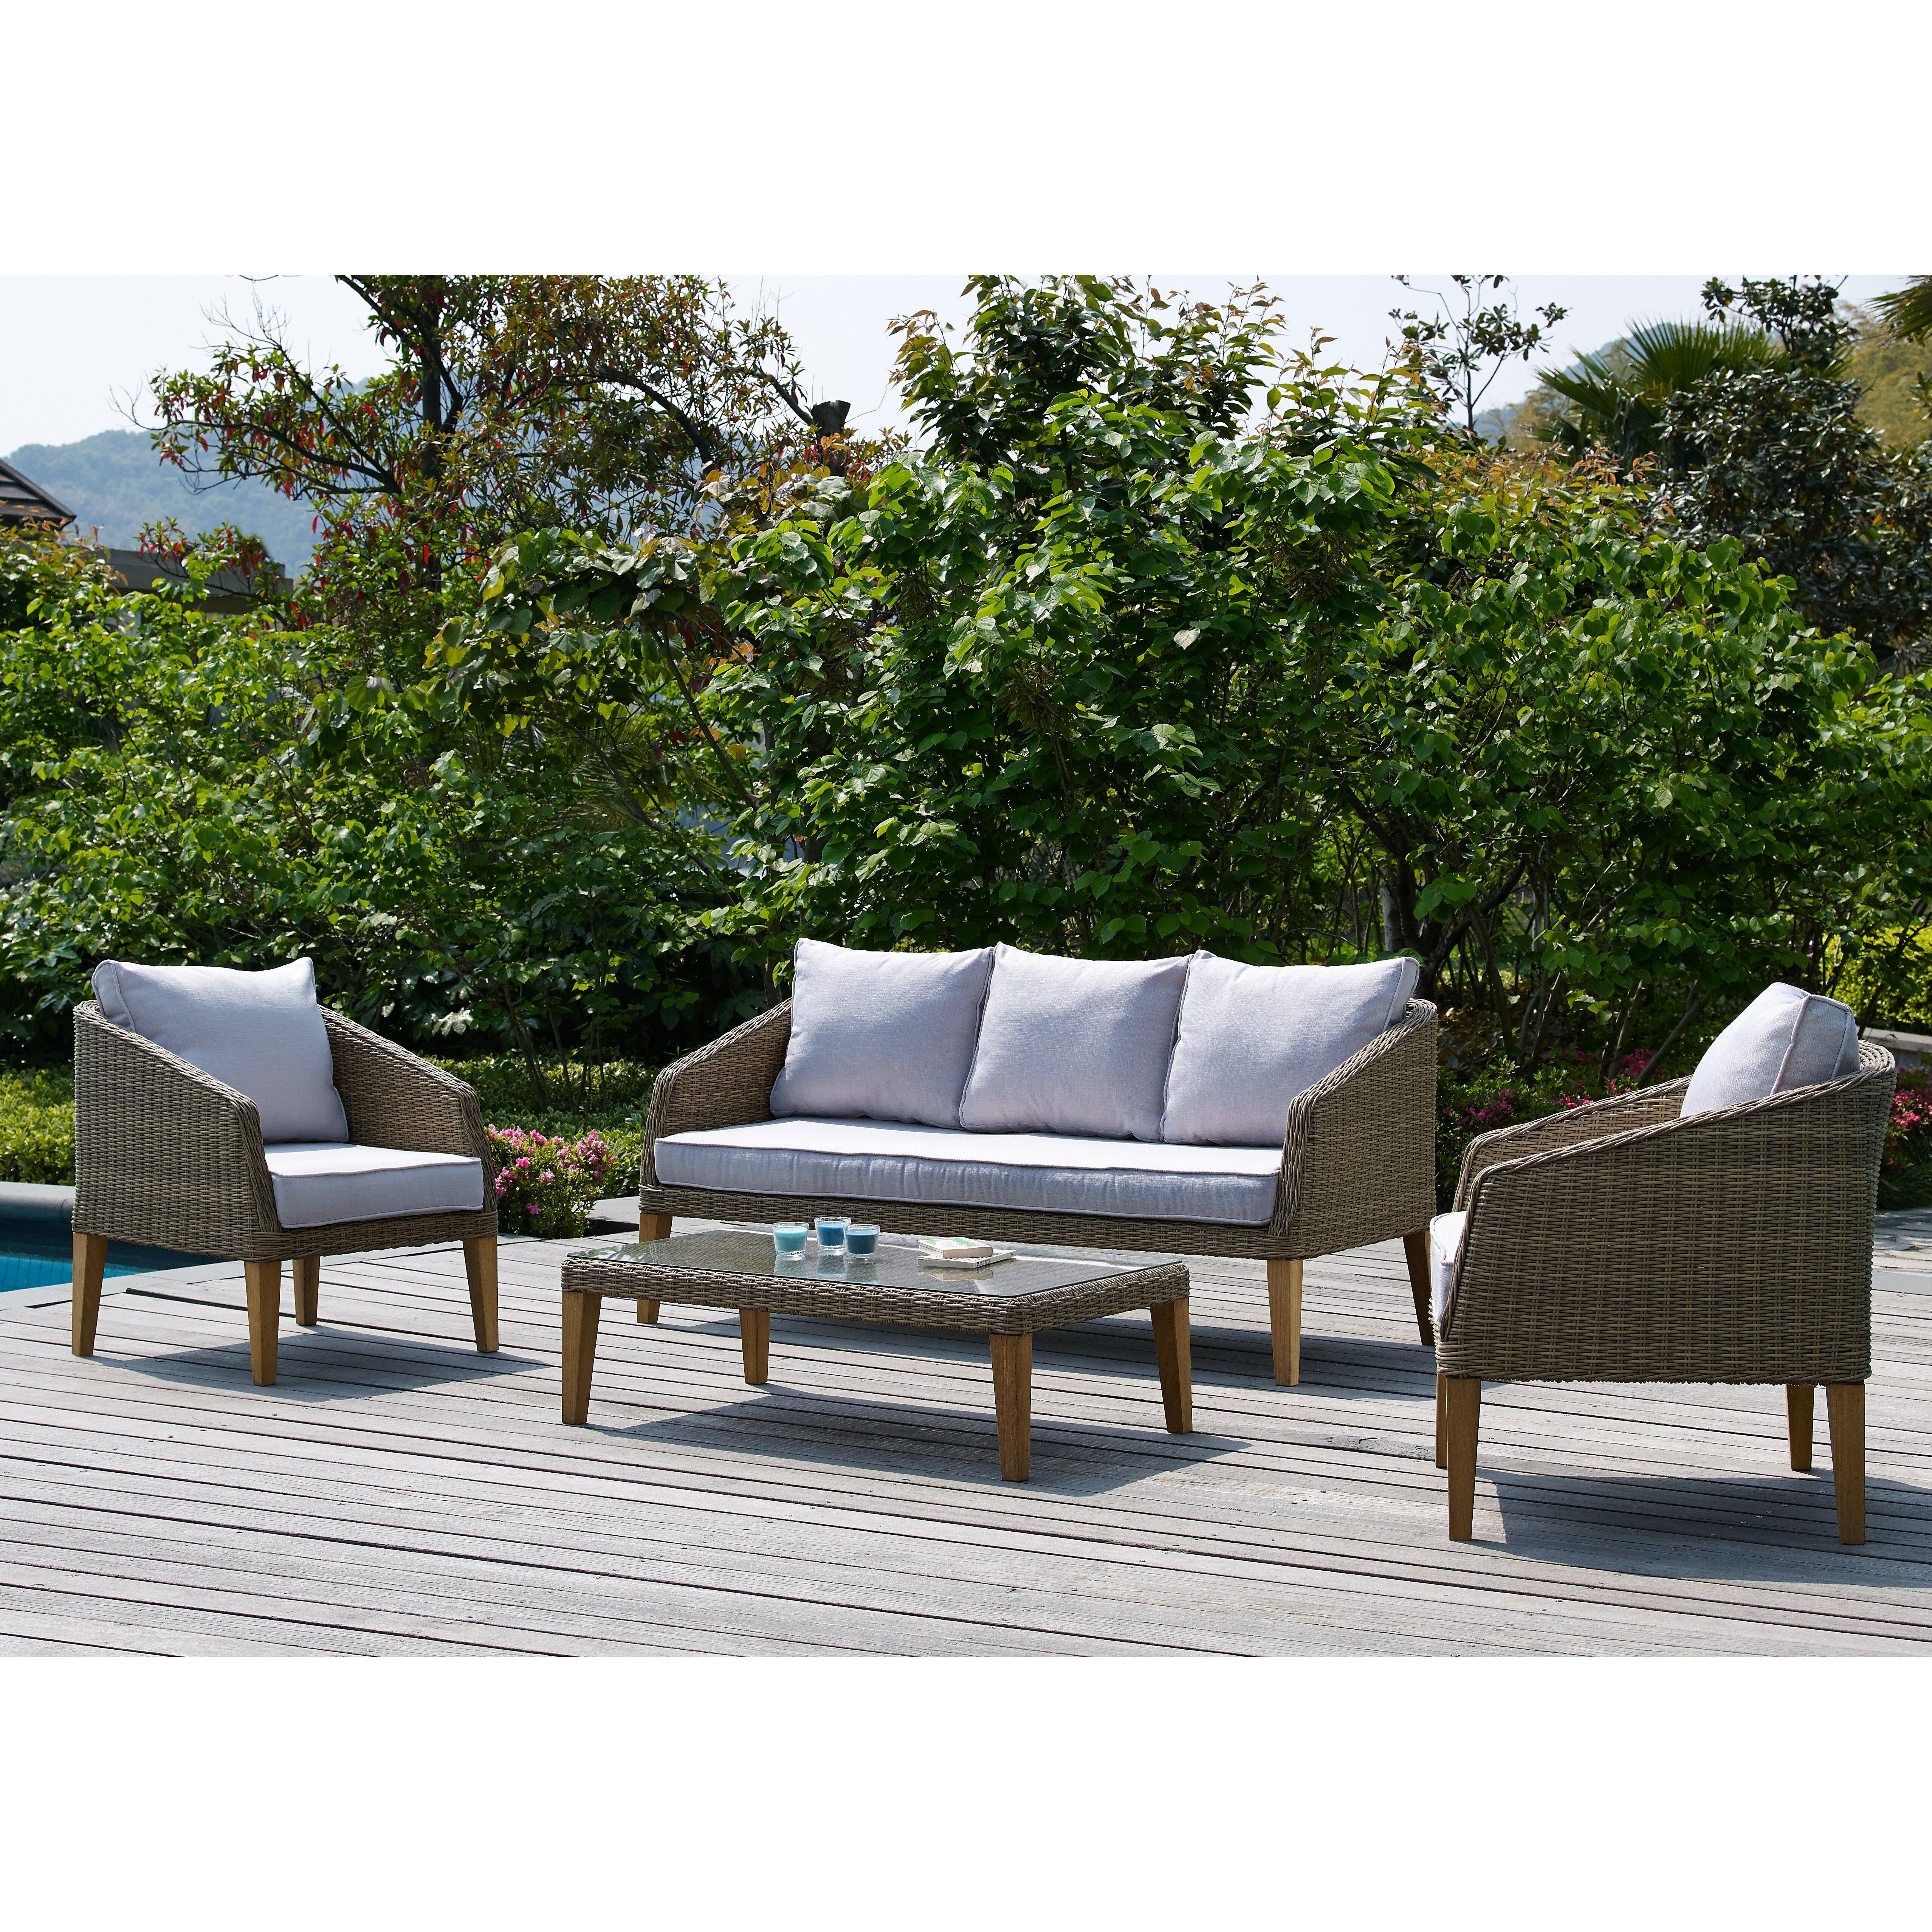 Brayden Studio Hypes 4 Piece Deep Seating Group With Natural Cushion Reviews Wayfair